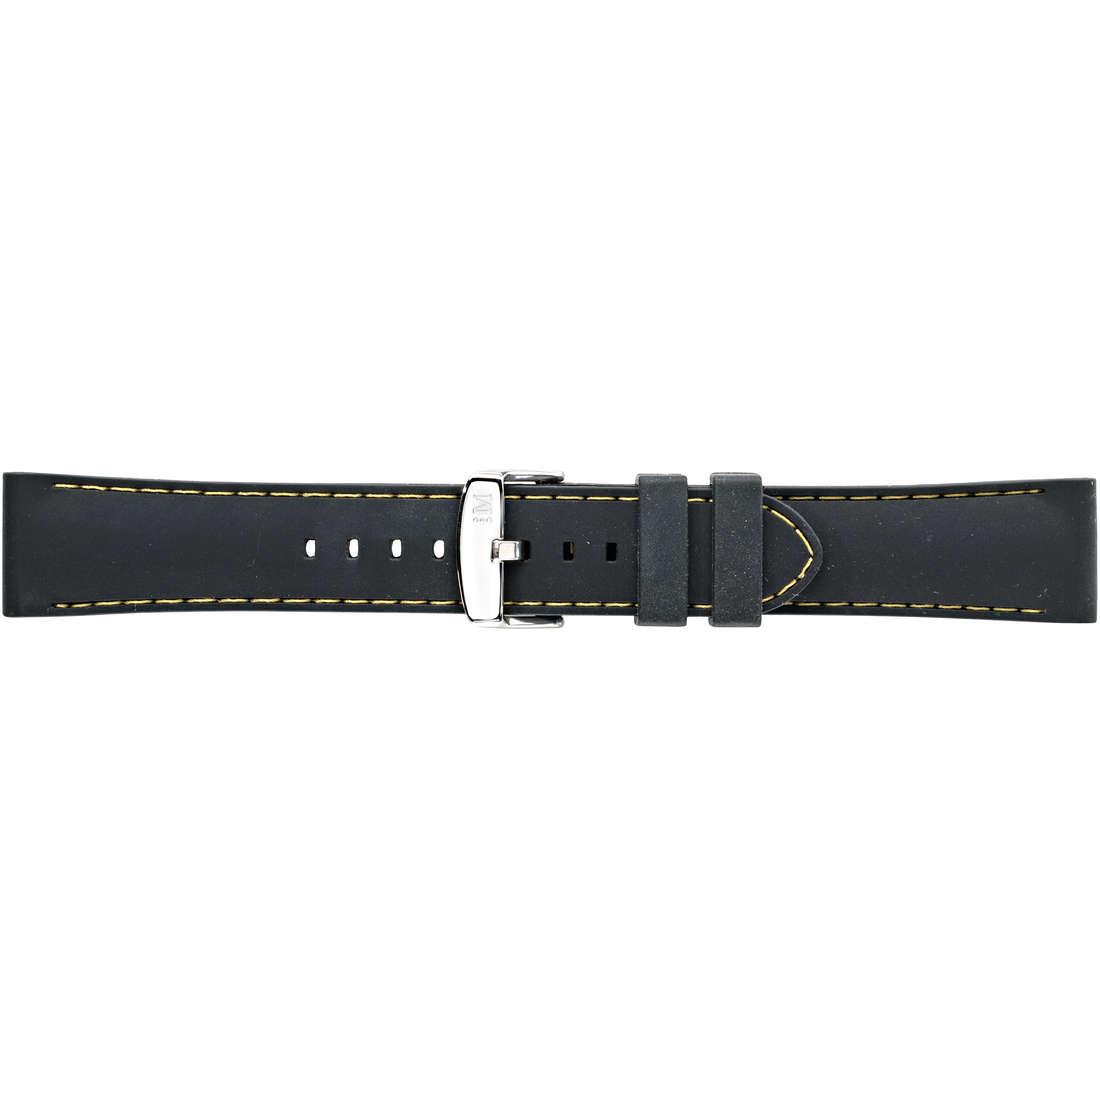 montre bande de montres homme Morellato Technogomma A01U3844187897CR22